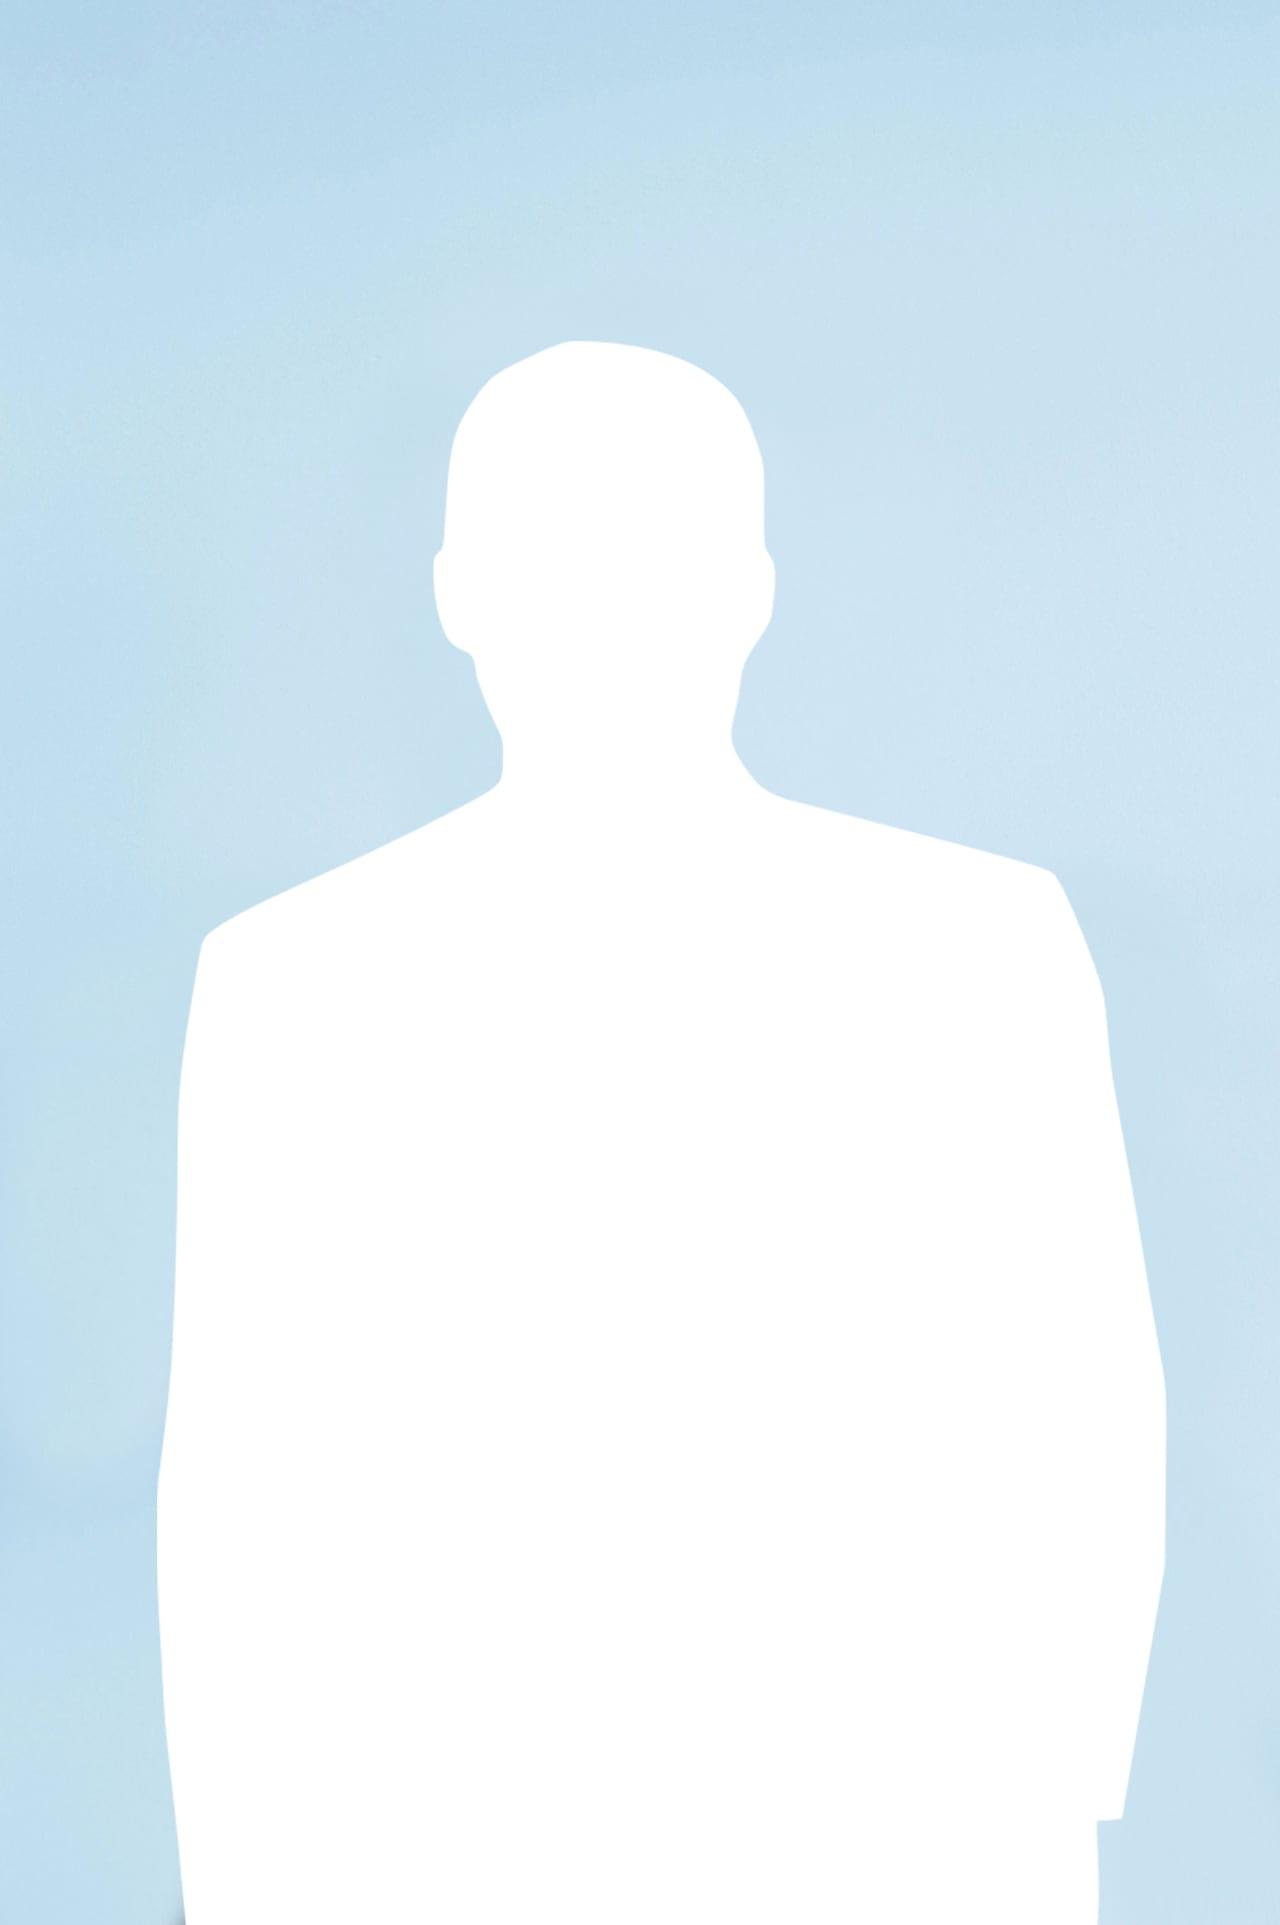 blank staff avatar rev 1.3 Meet the Team